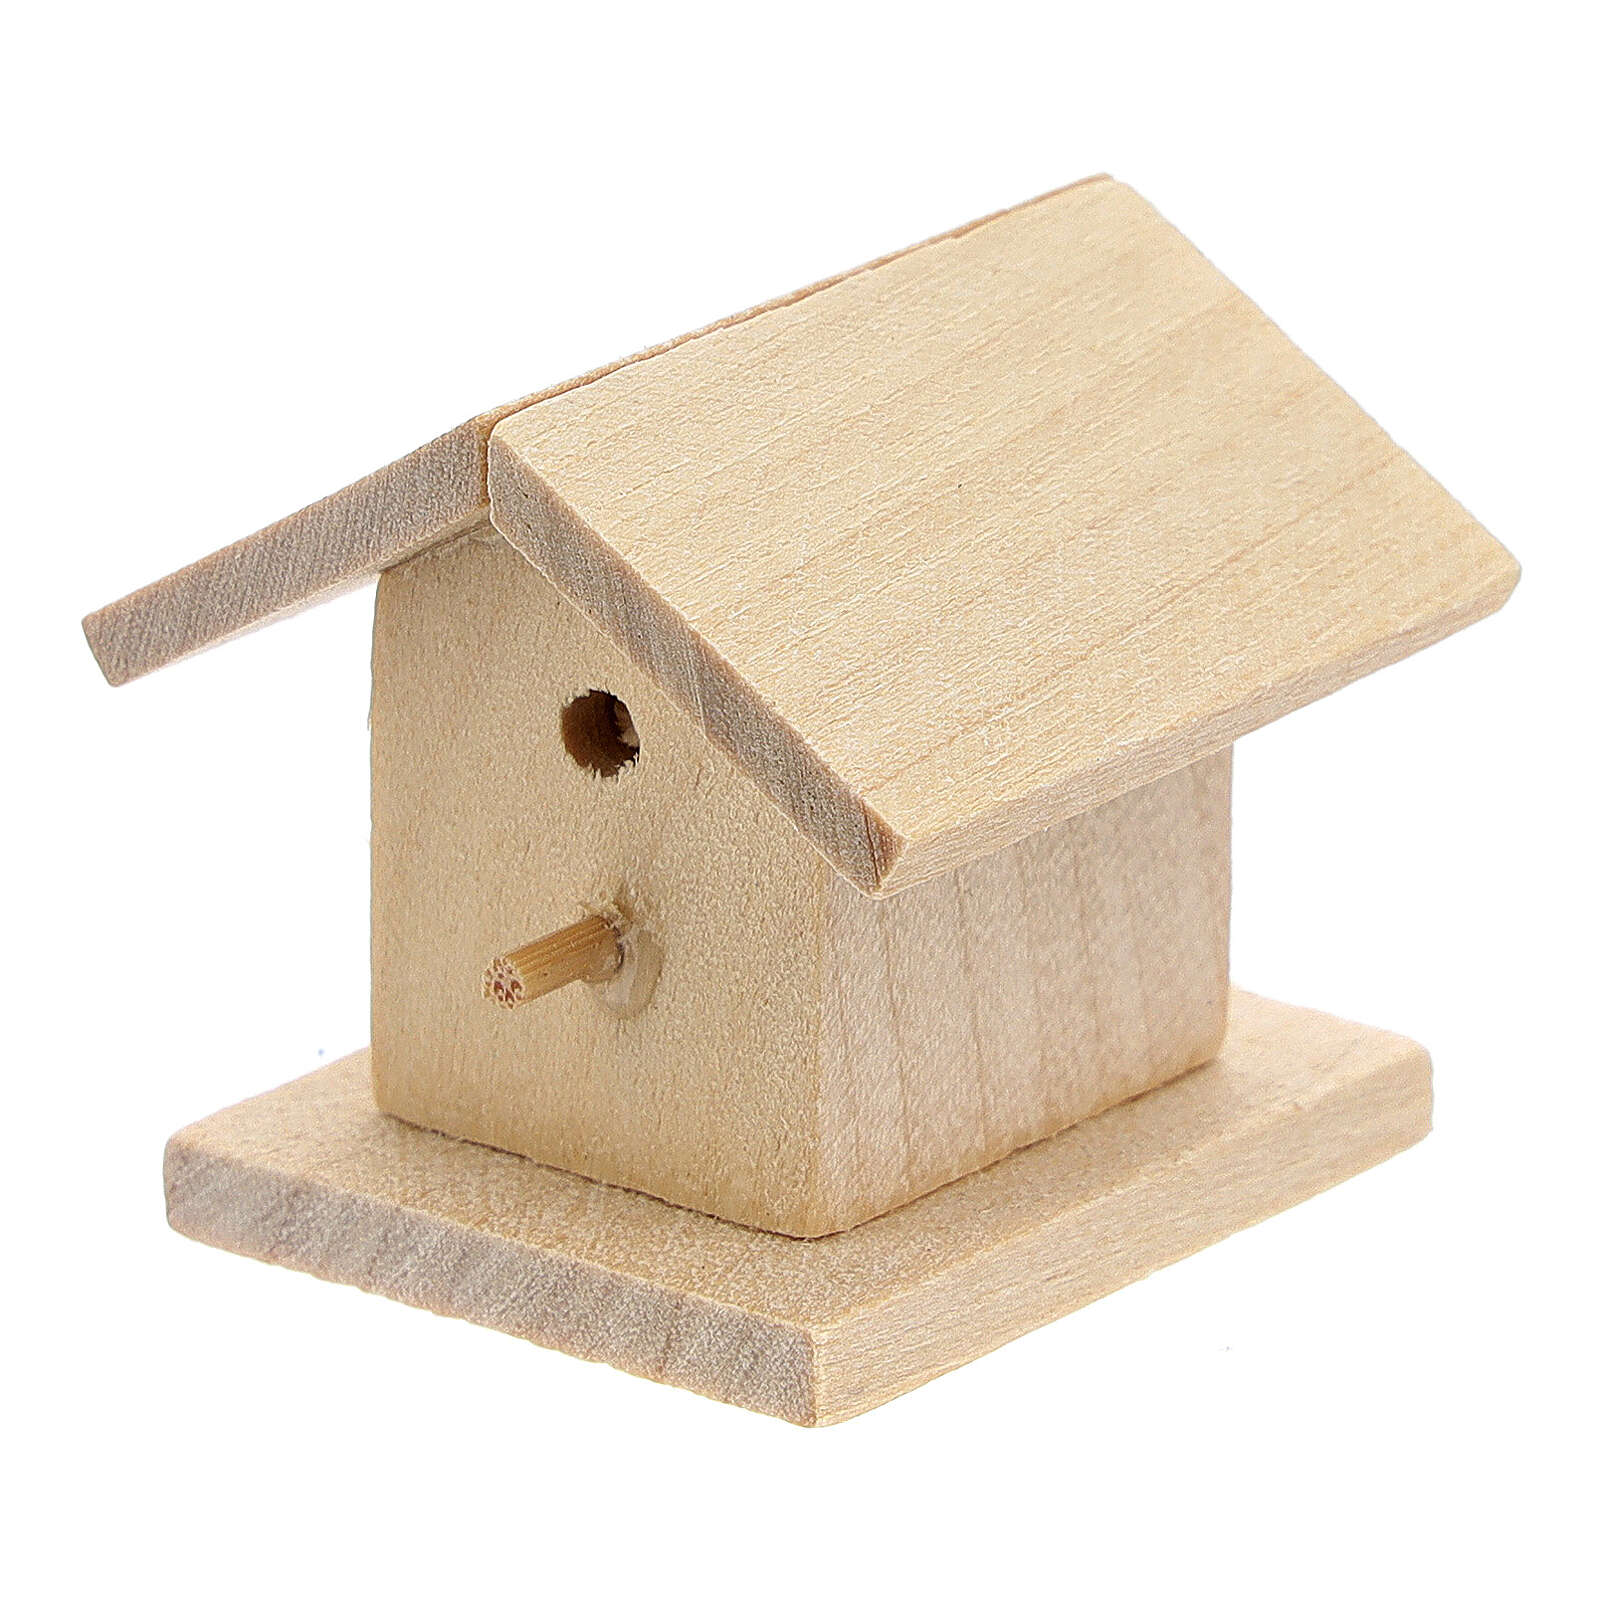 Wooden bird house Nativity scene 8-10 cm 3